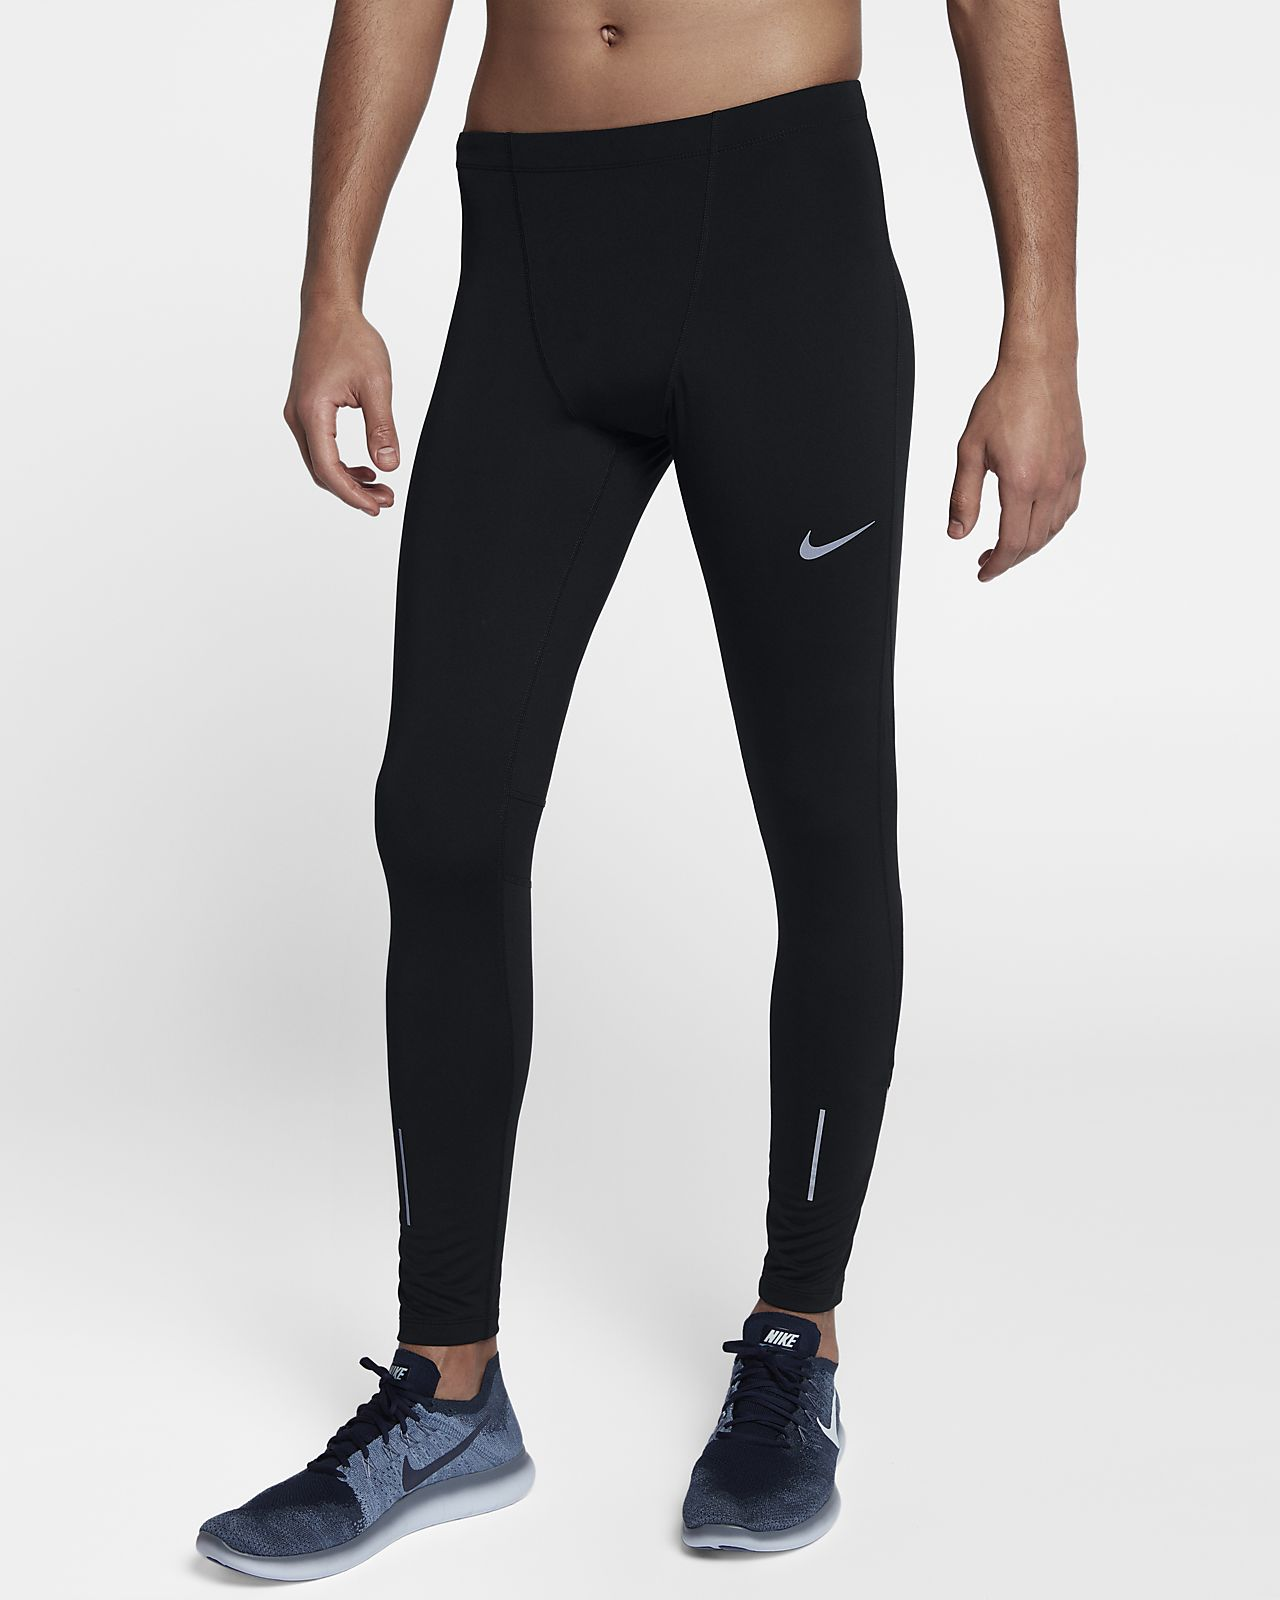 Nike Therma Run Malles de running (72 cm) - Home